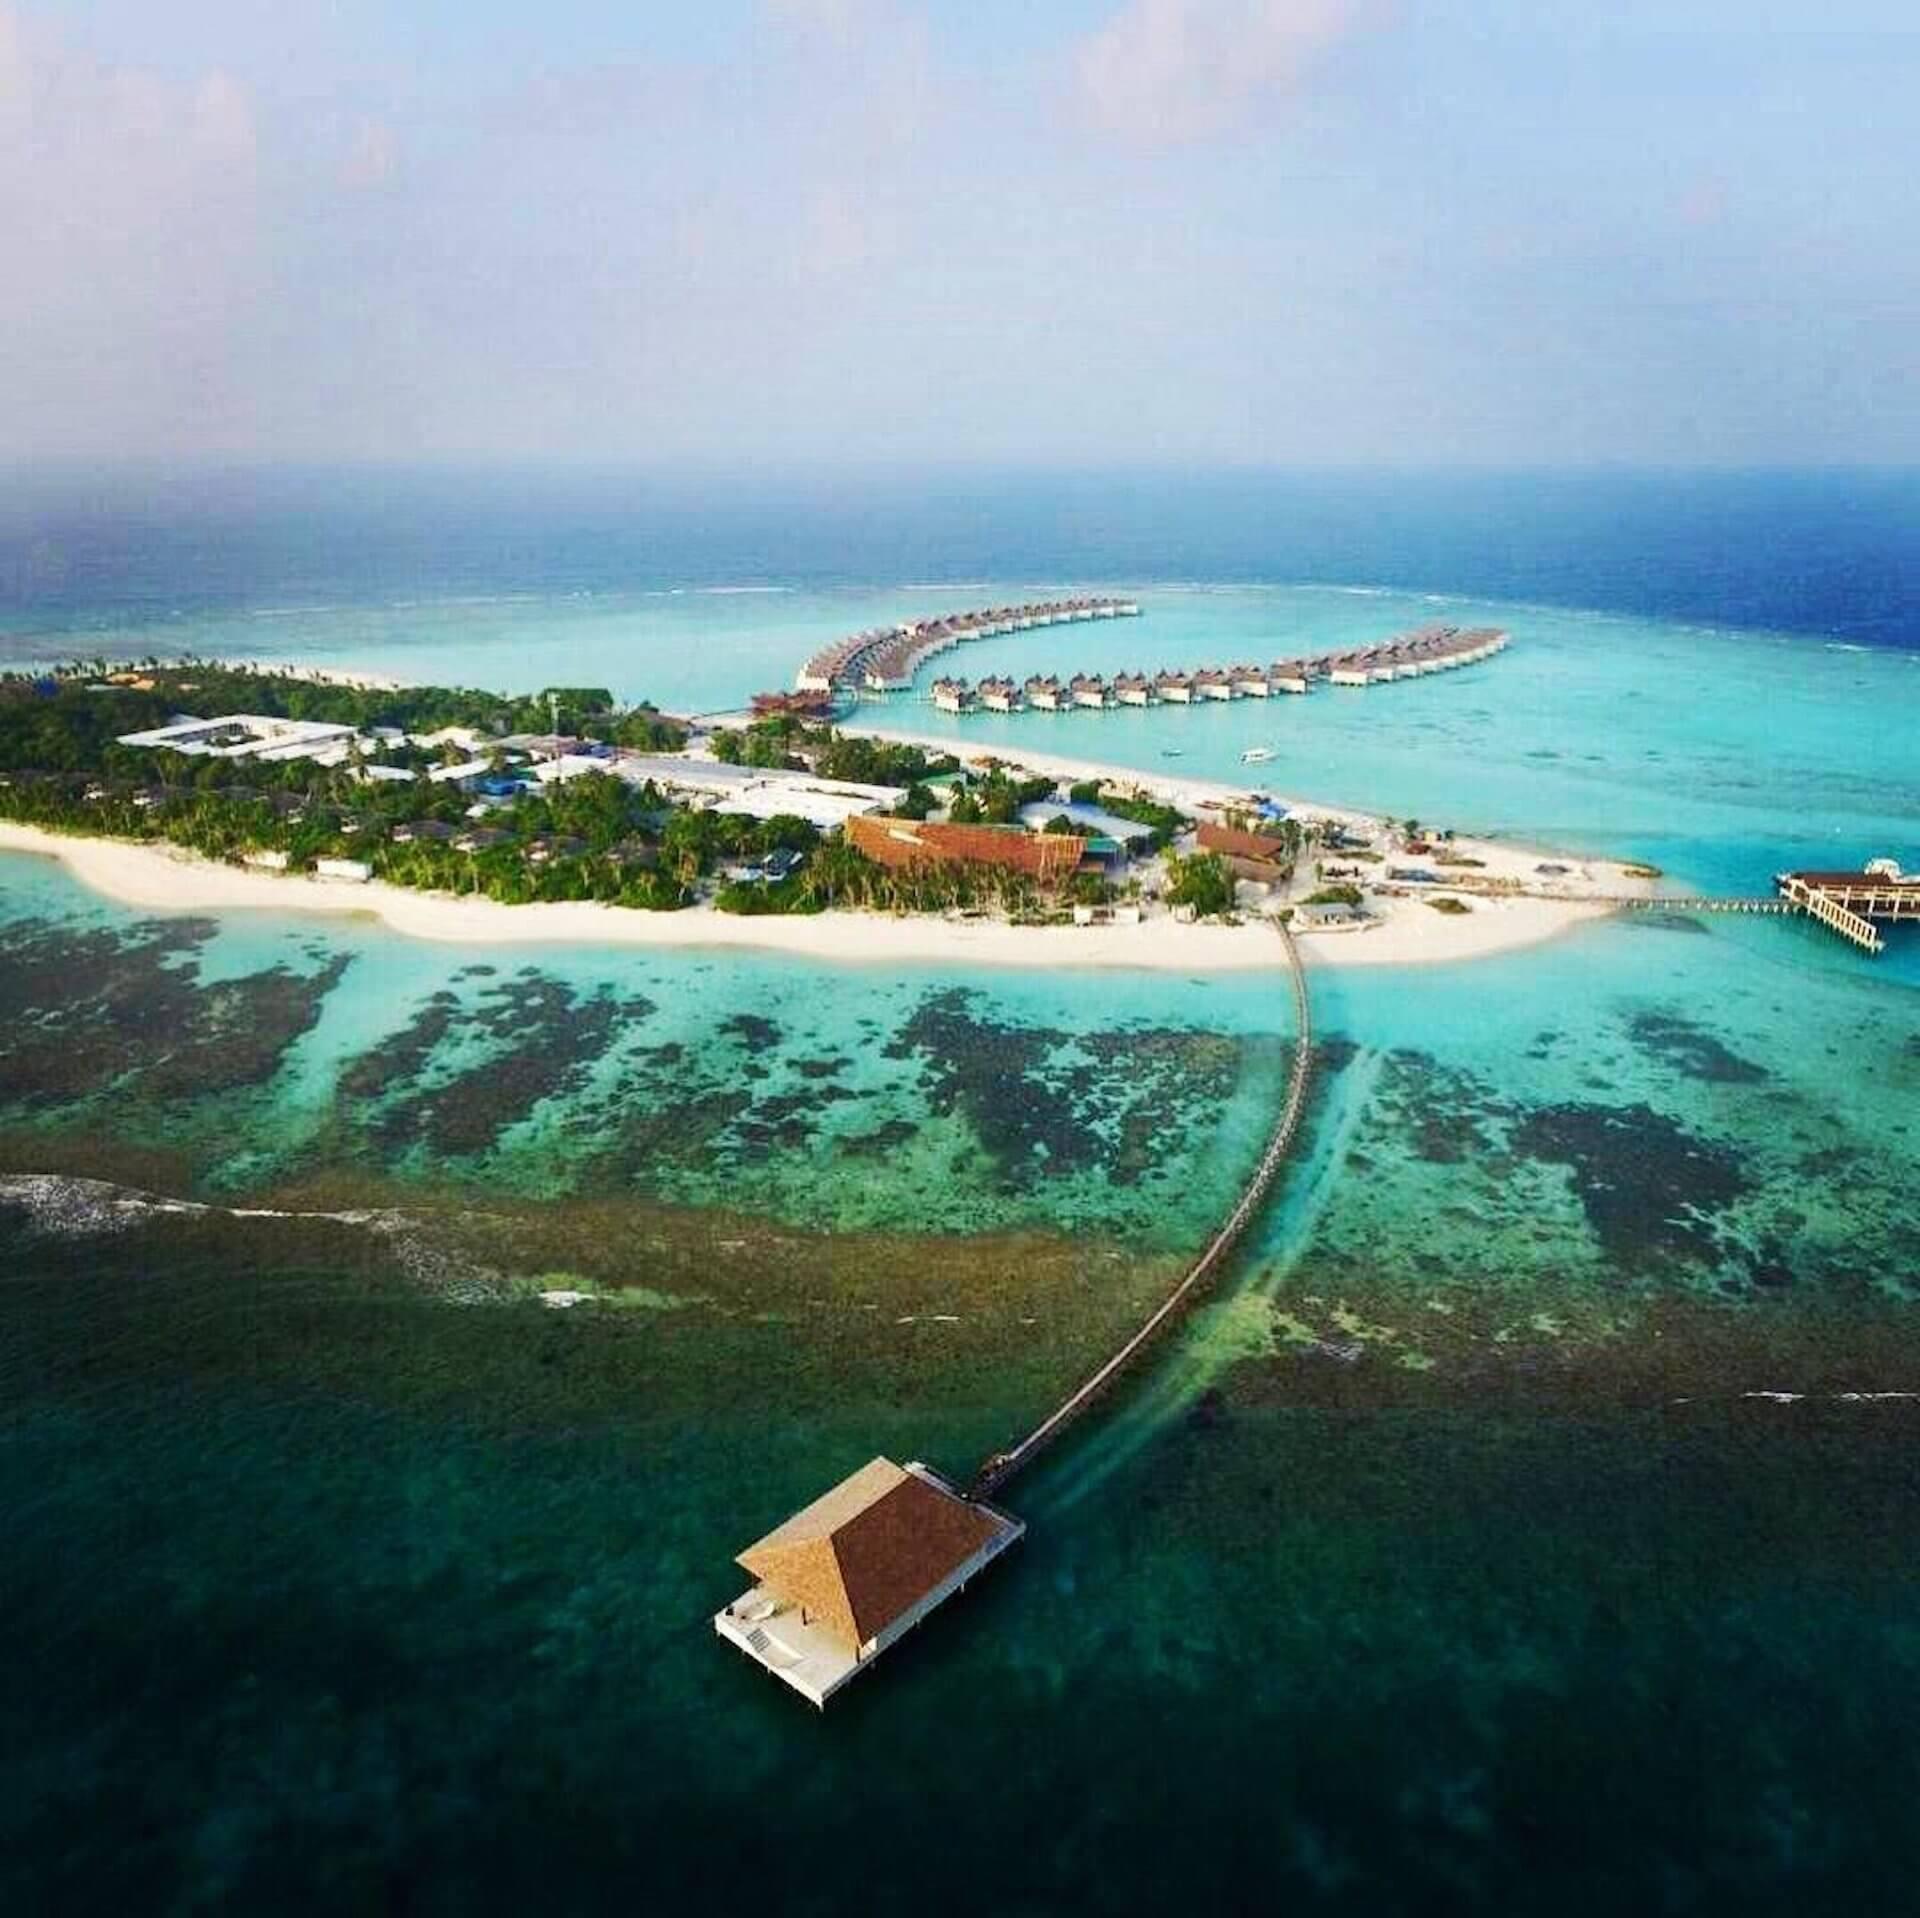 Mӧvenpick Maldives Location Hummingbird Travel